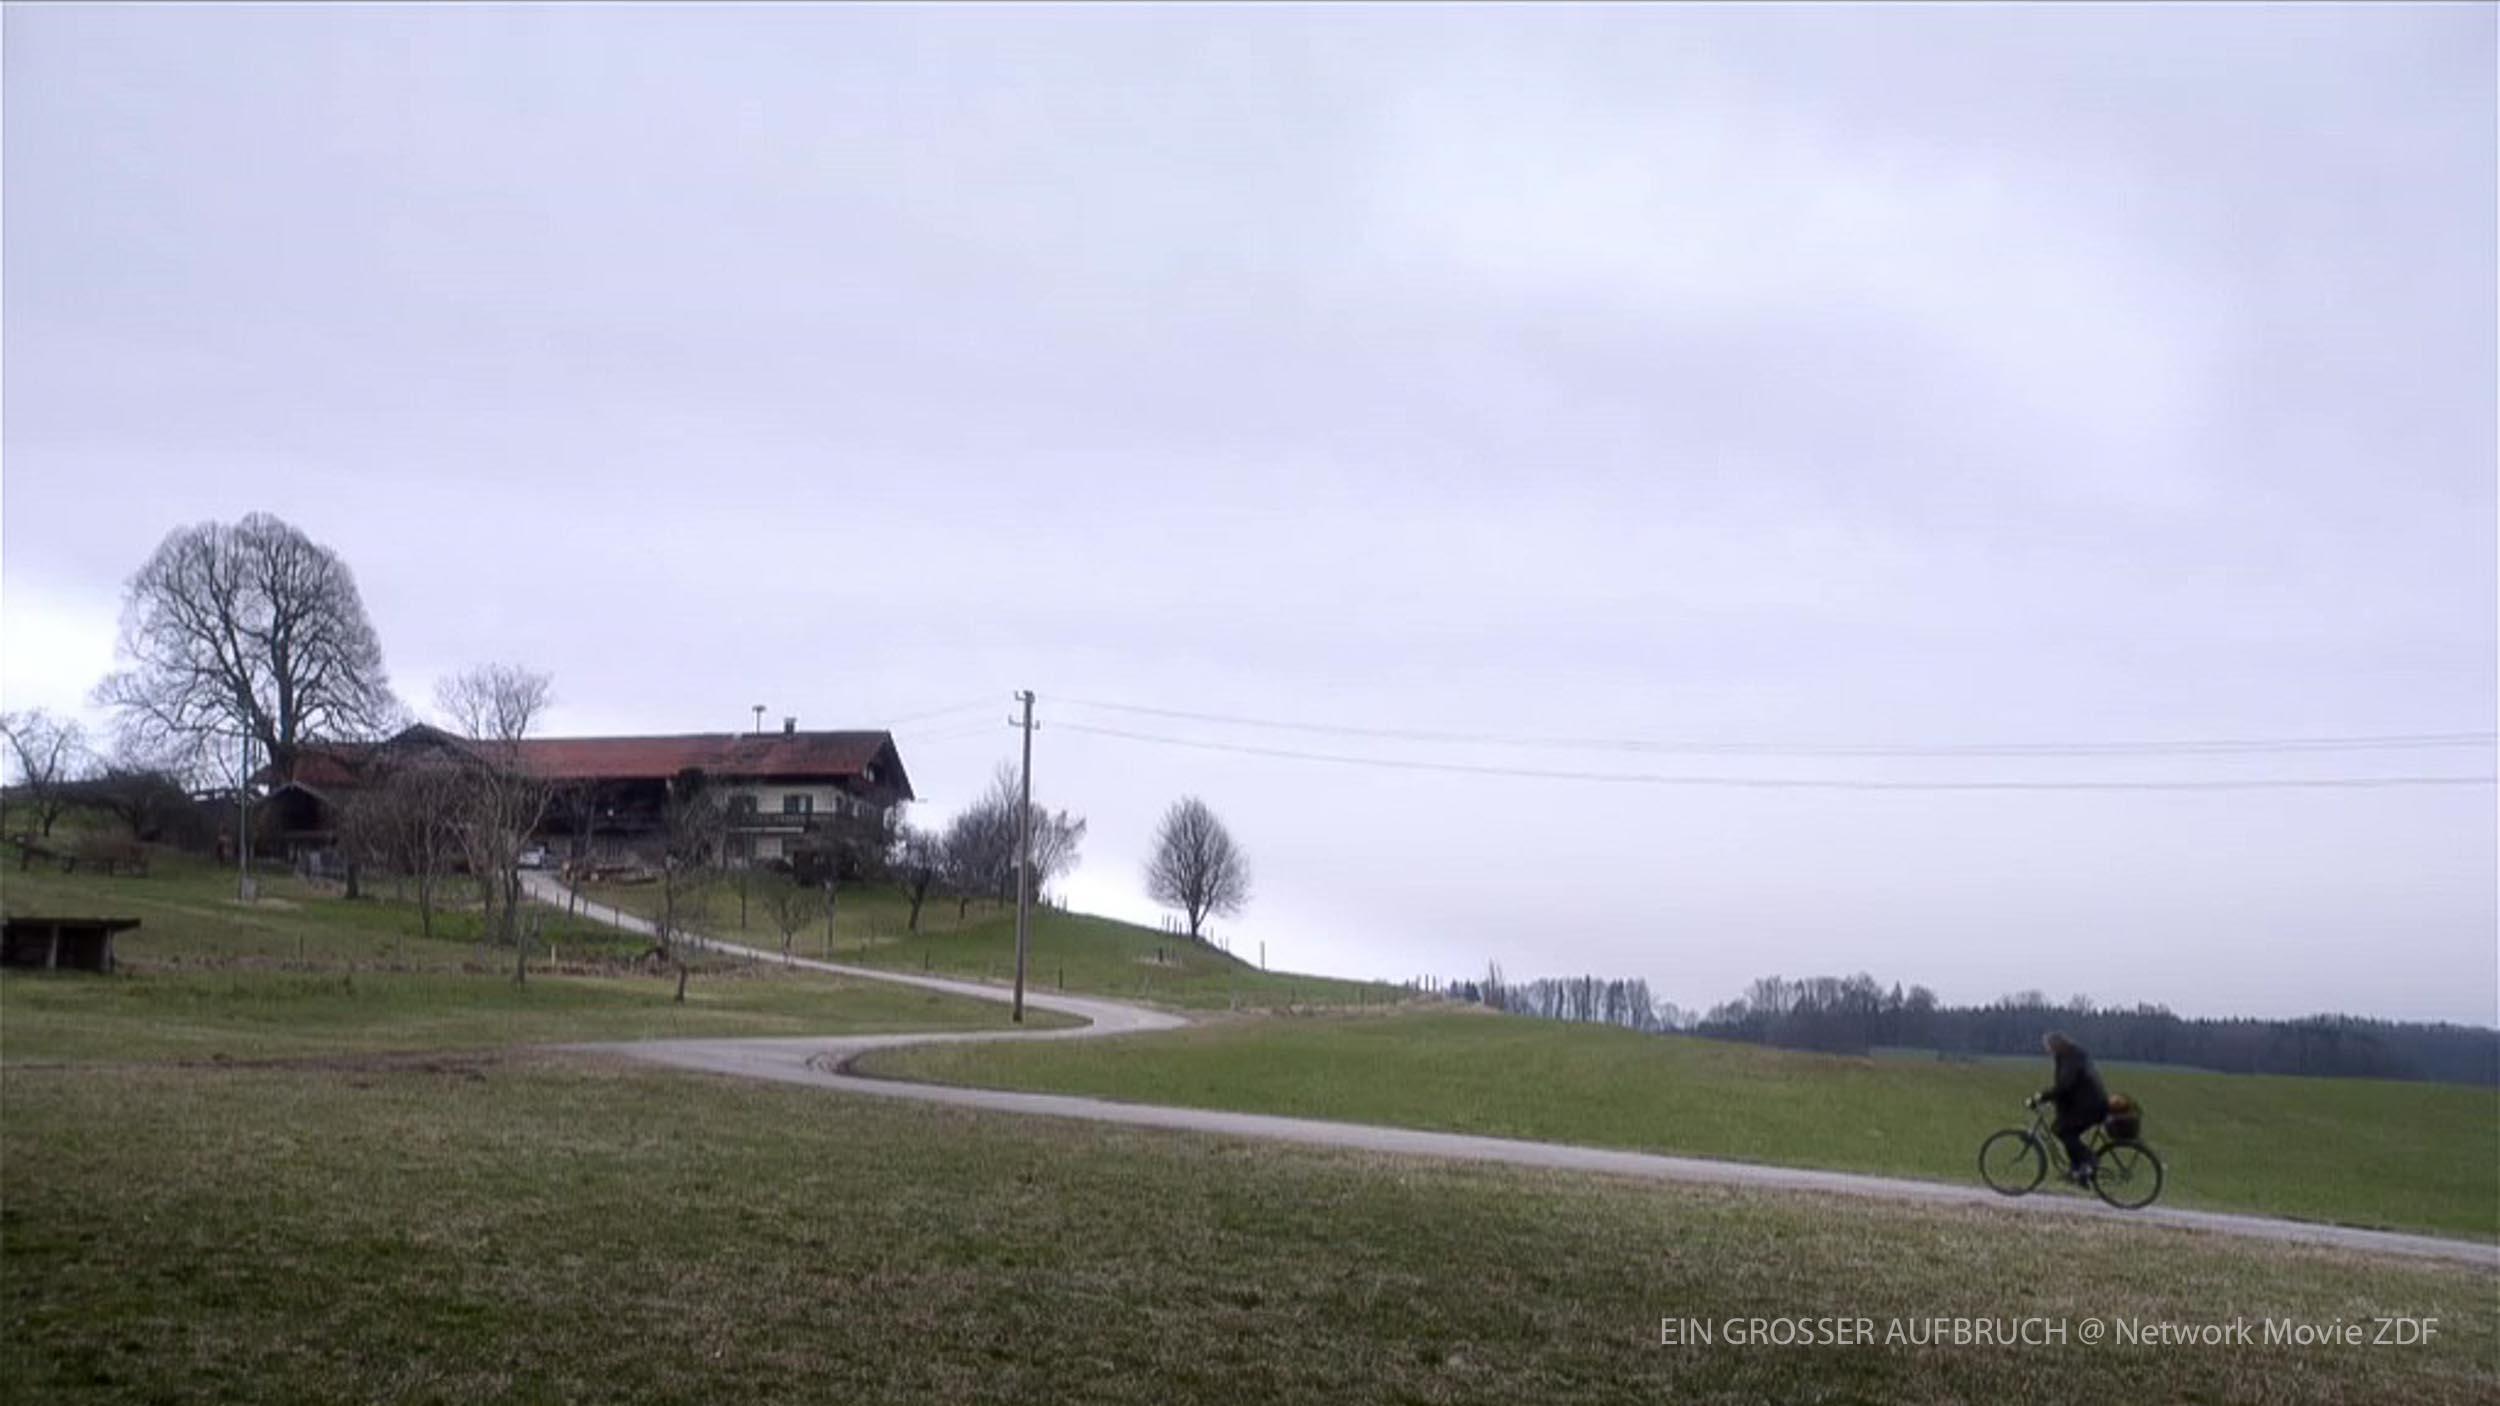 EIN GROSSER AUFBRUCH Regie Matti Geschonneck Szenenbild Thomas Freudenthal-1.jpg